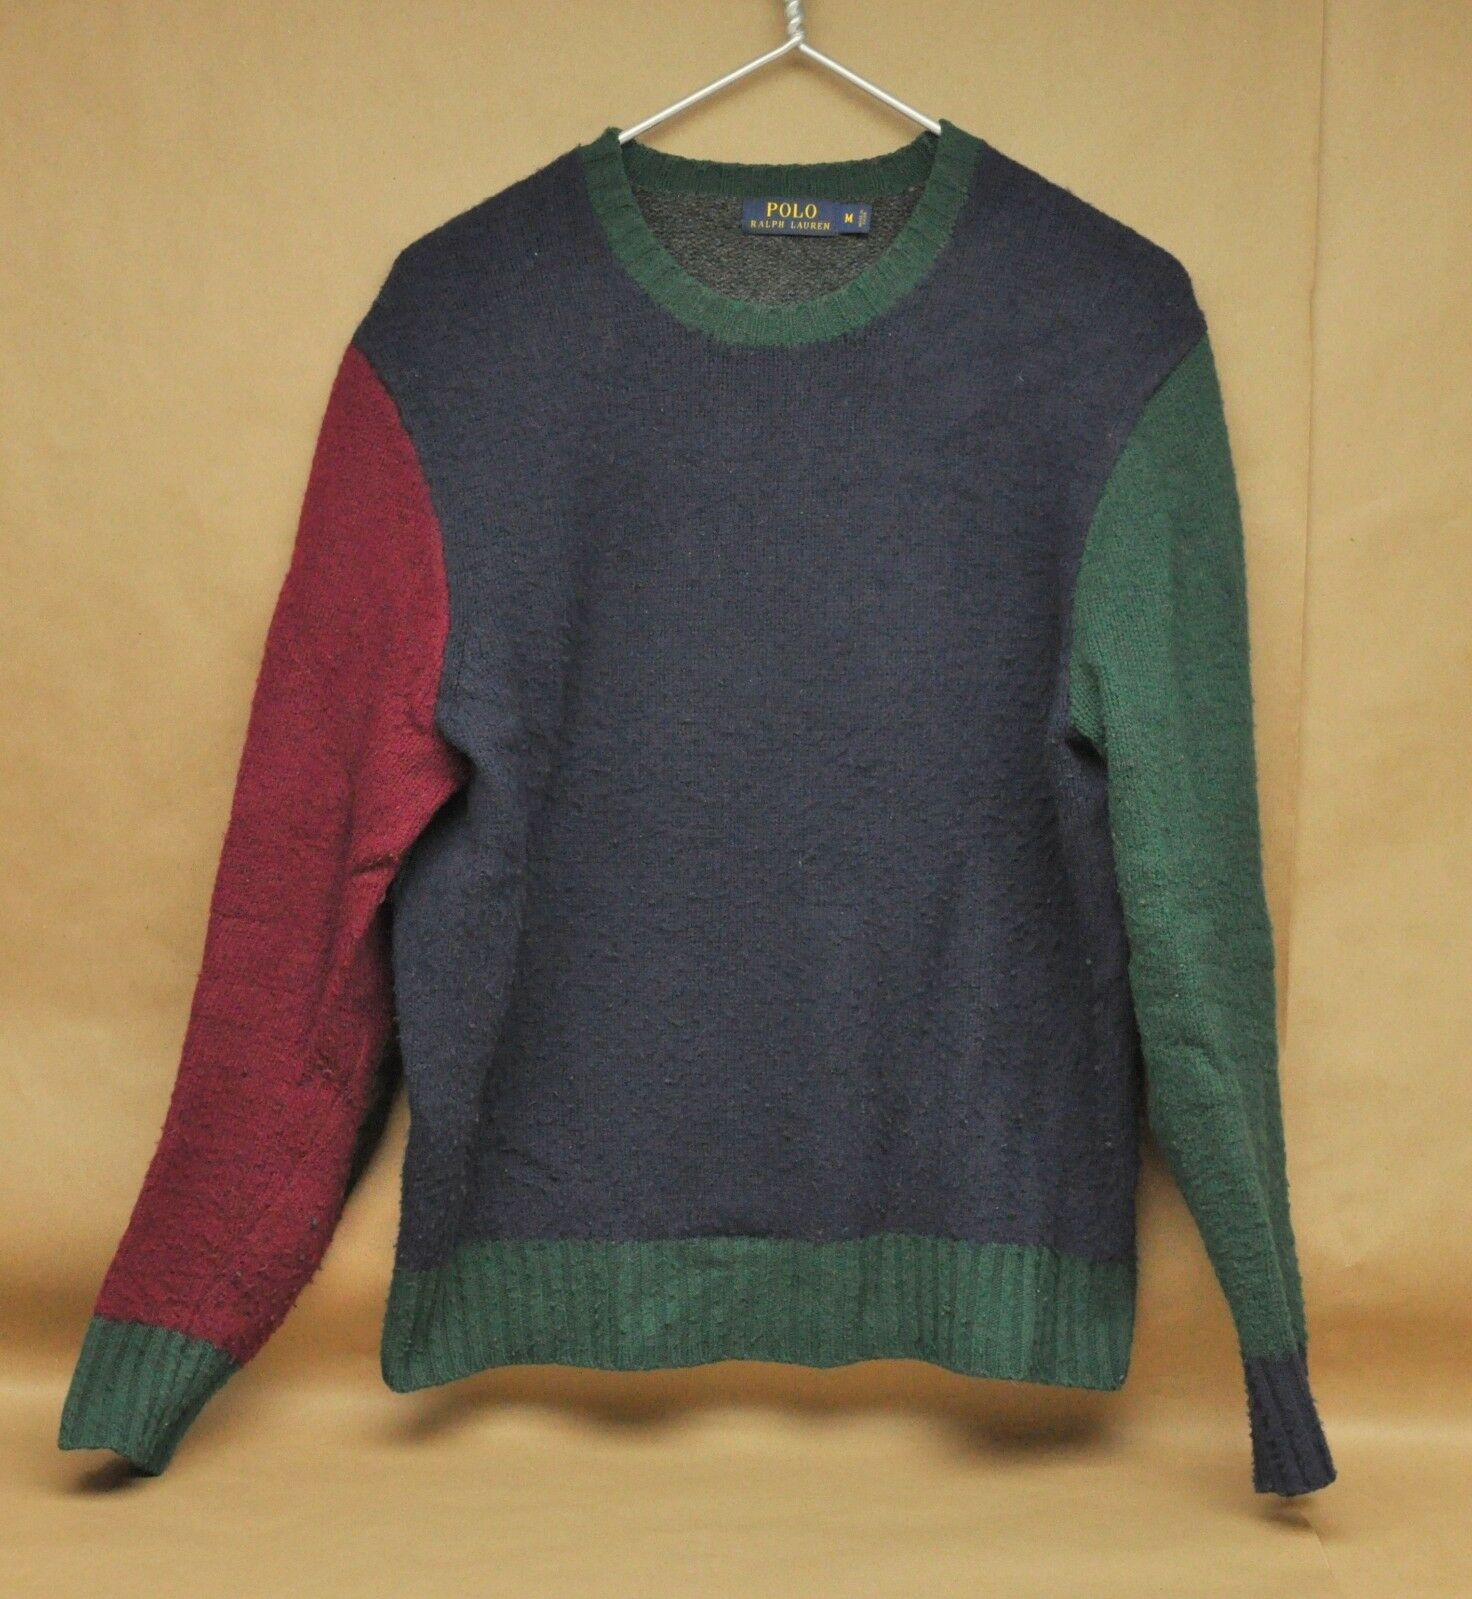 Vintage Polo Ralph Lauren 100% Wool Sweater Medium Maroon Red bluee Green